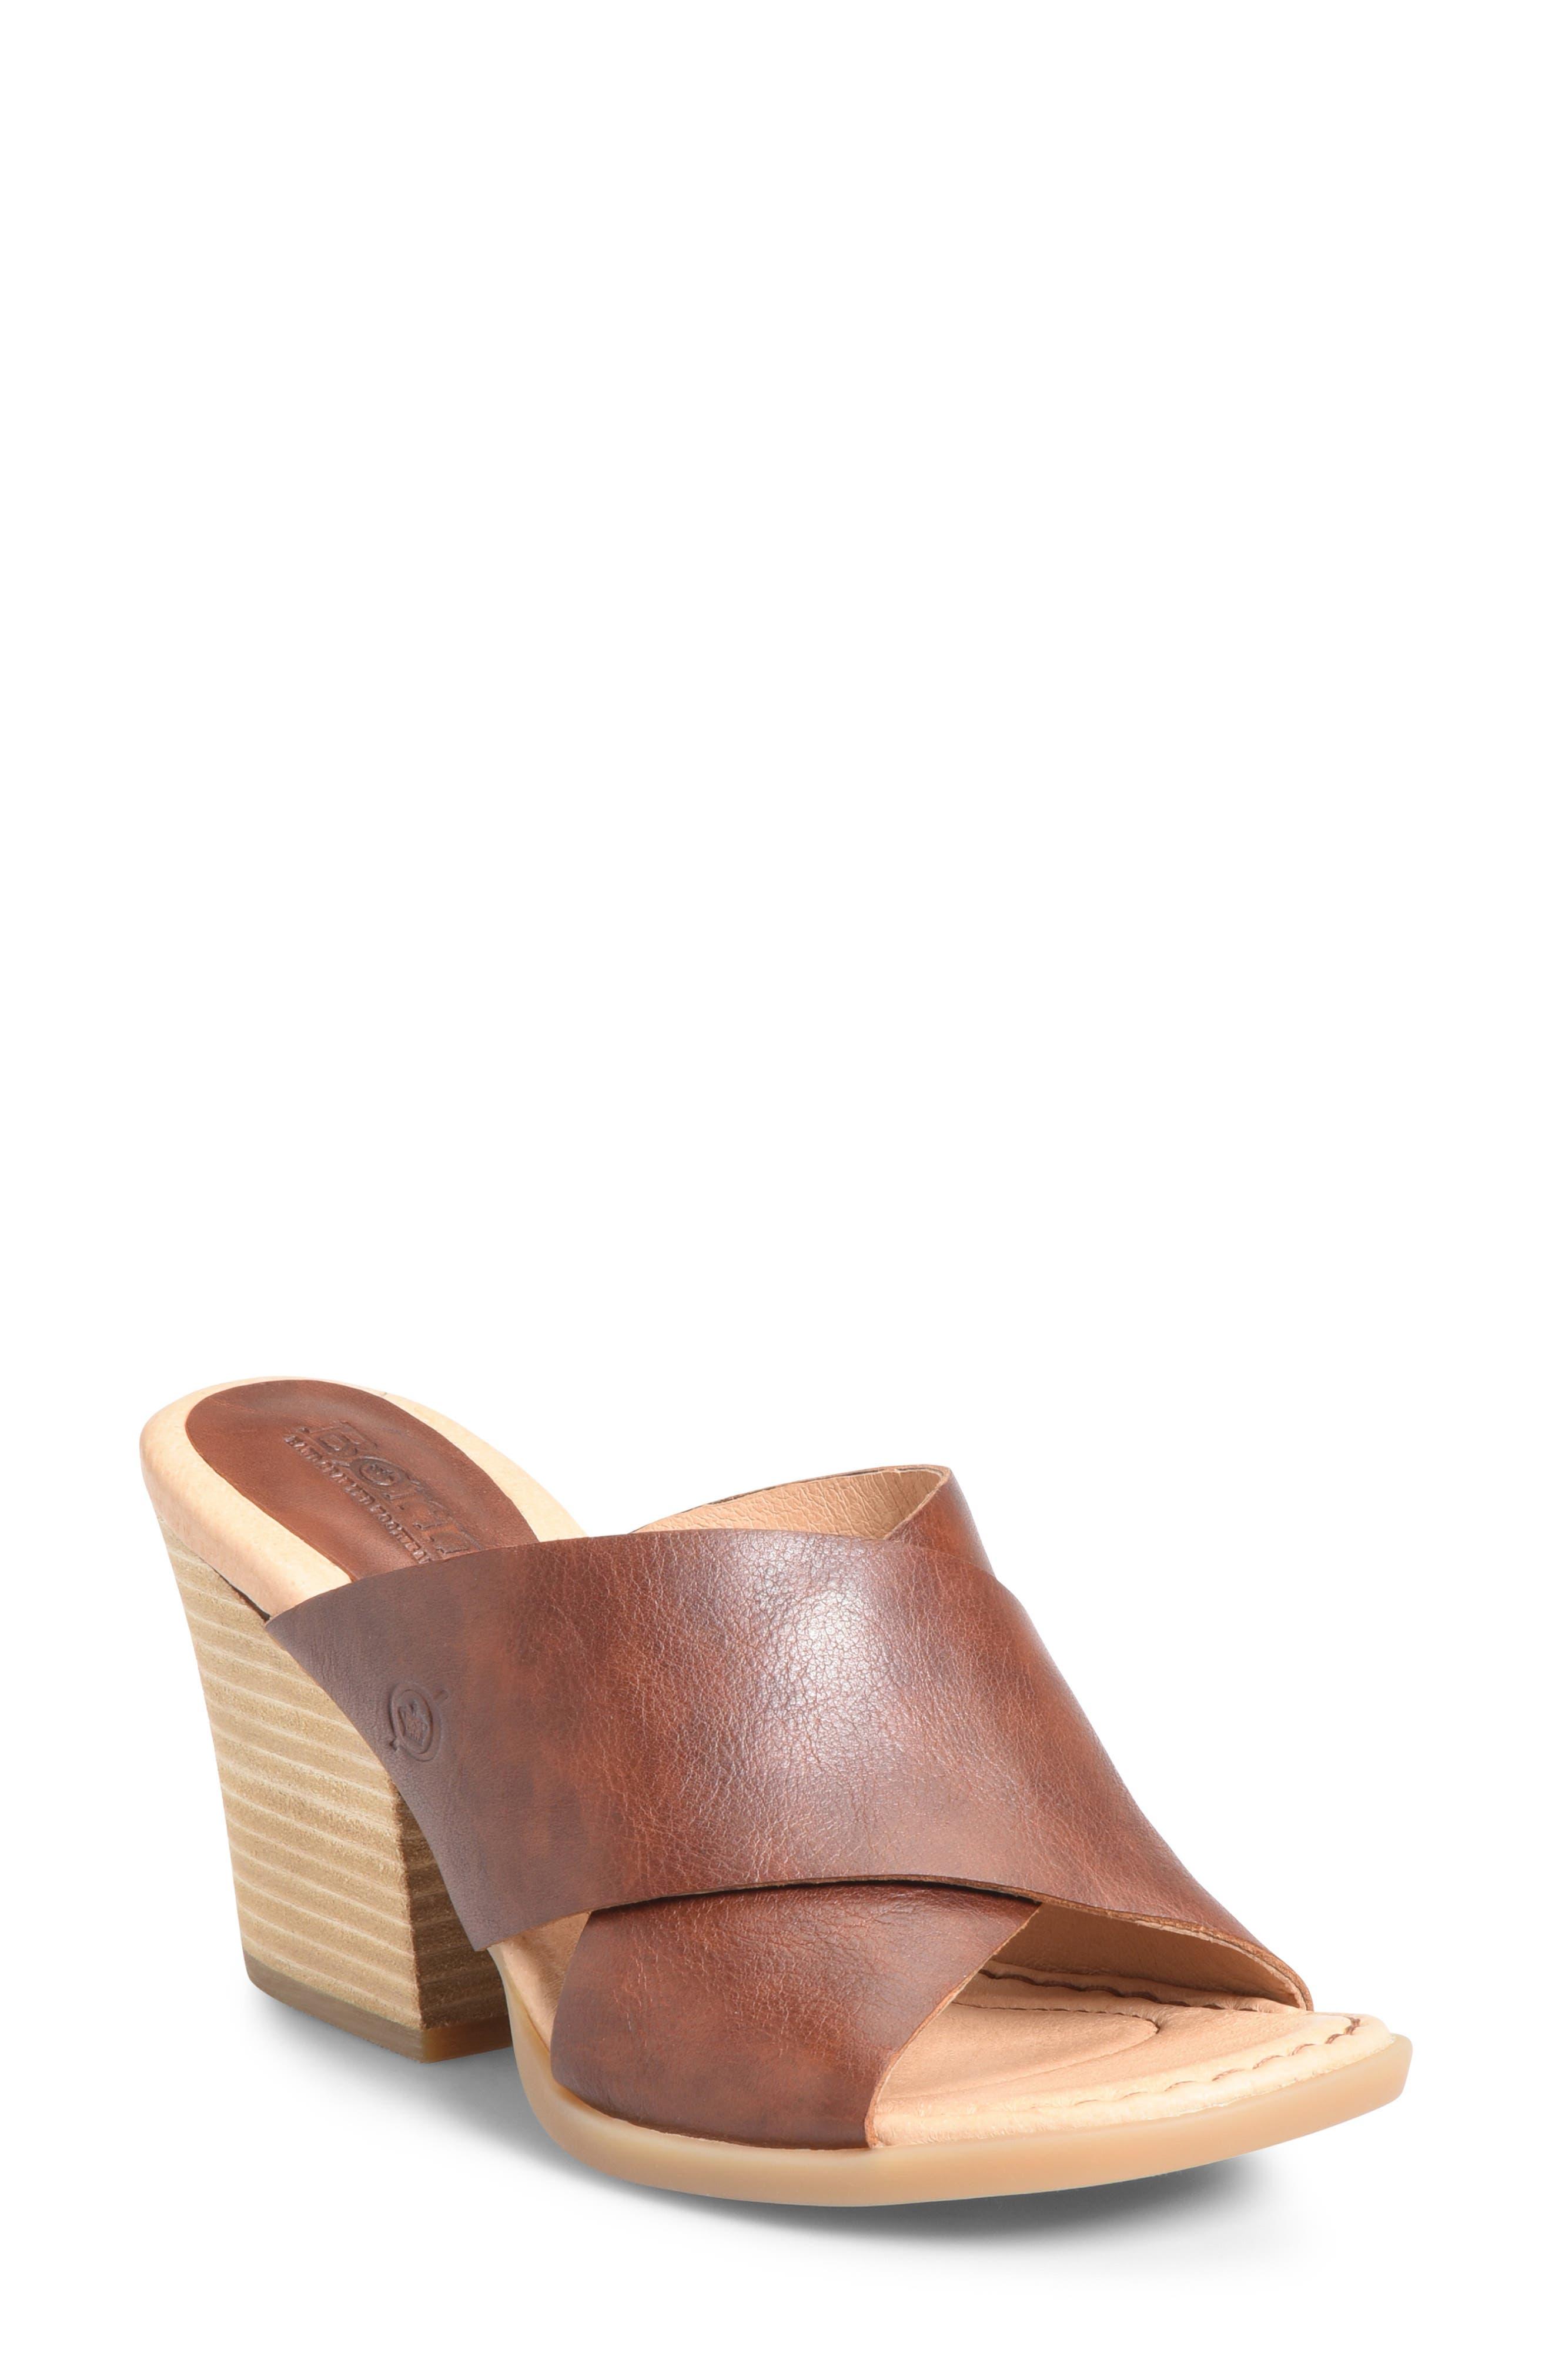 Madison Cross Strap Slide Sandal, Main, color, BROWN LEATHER